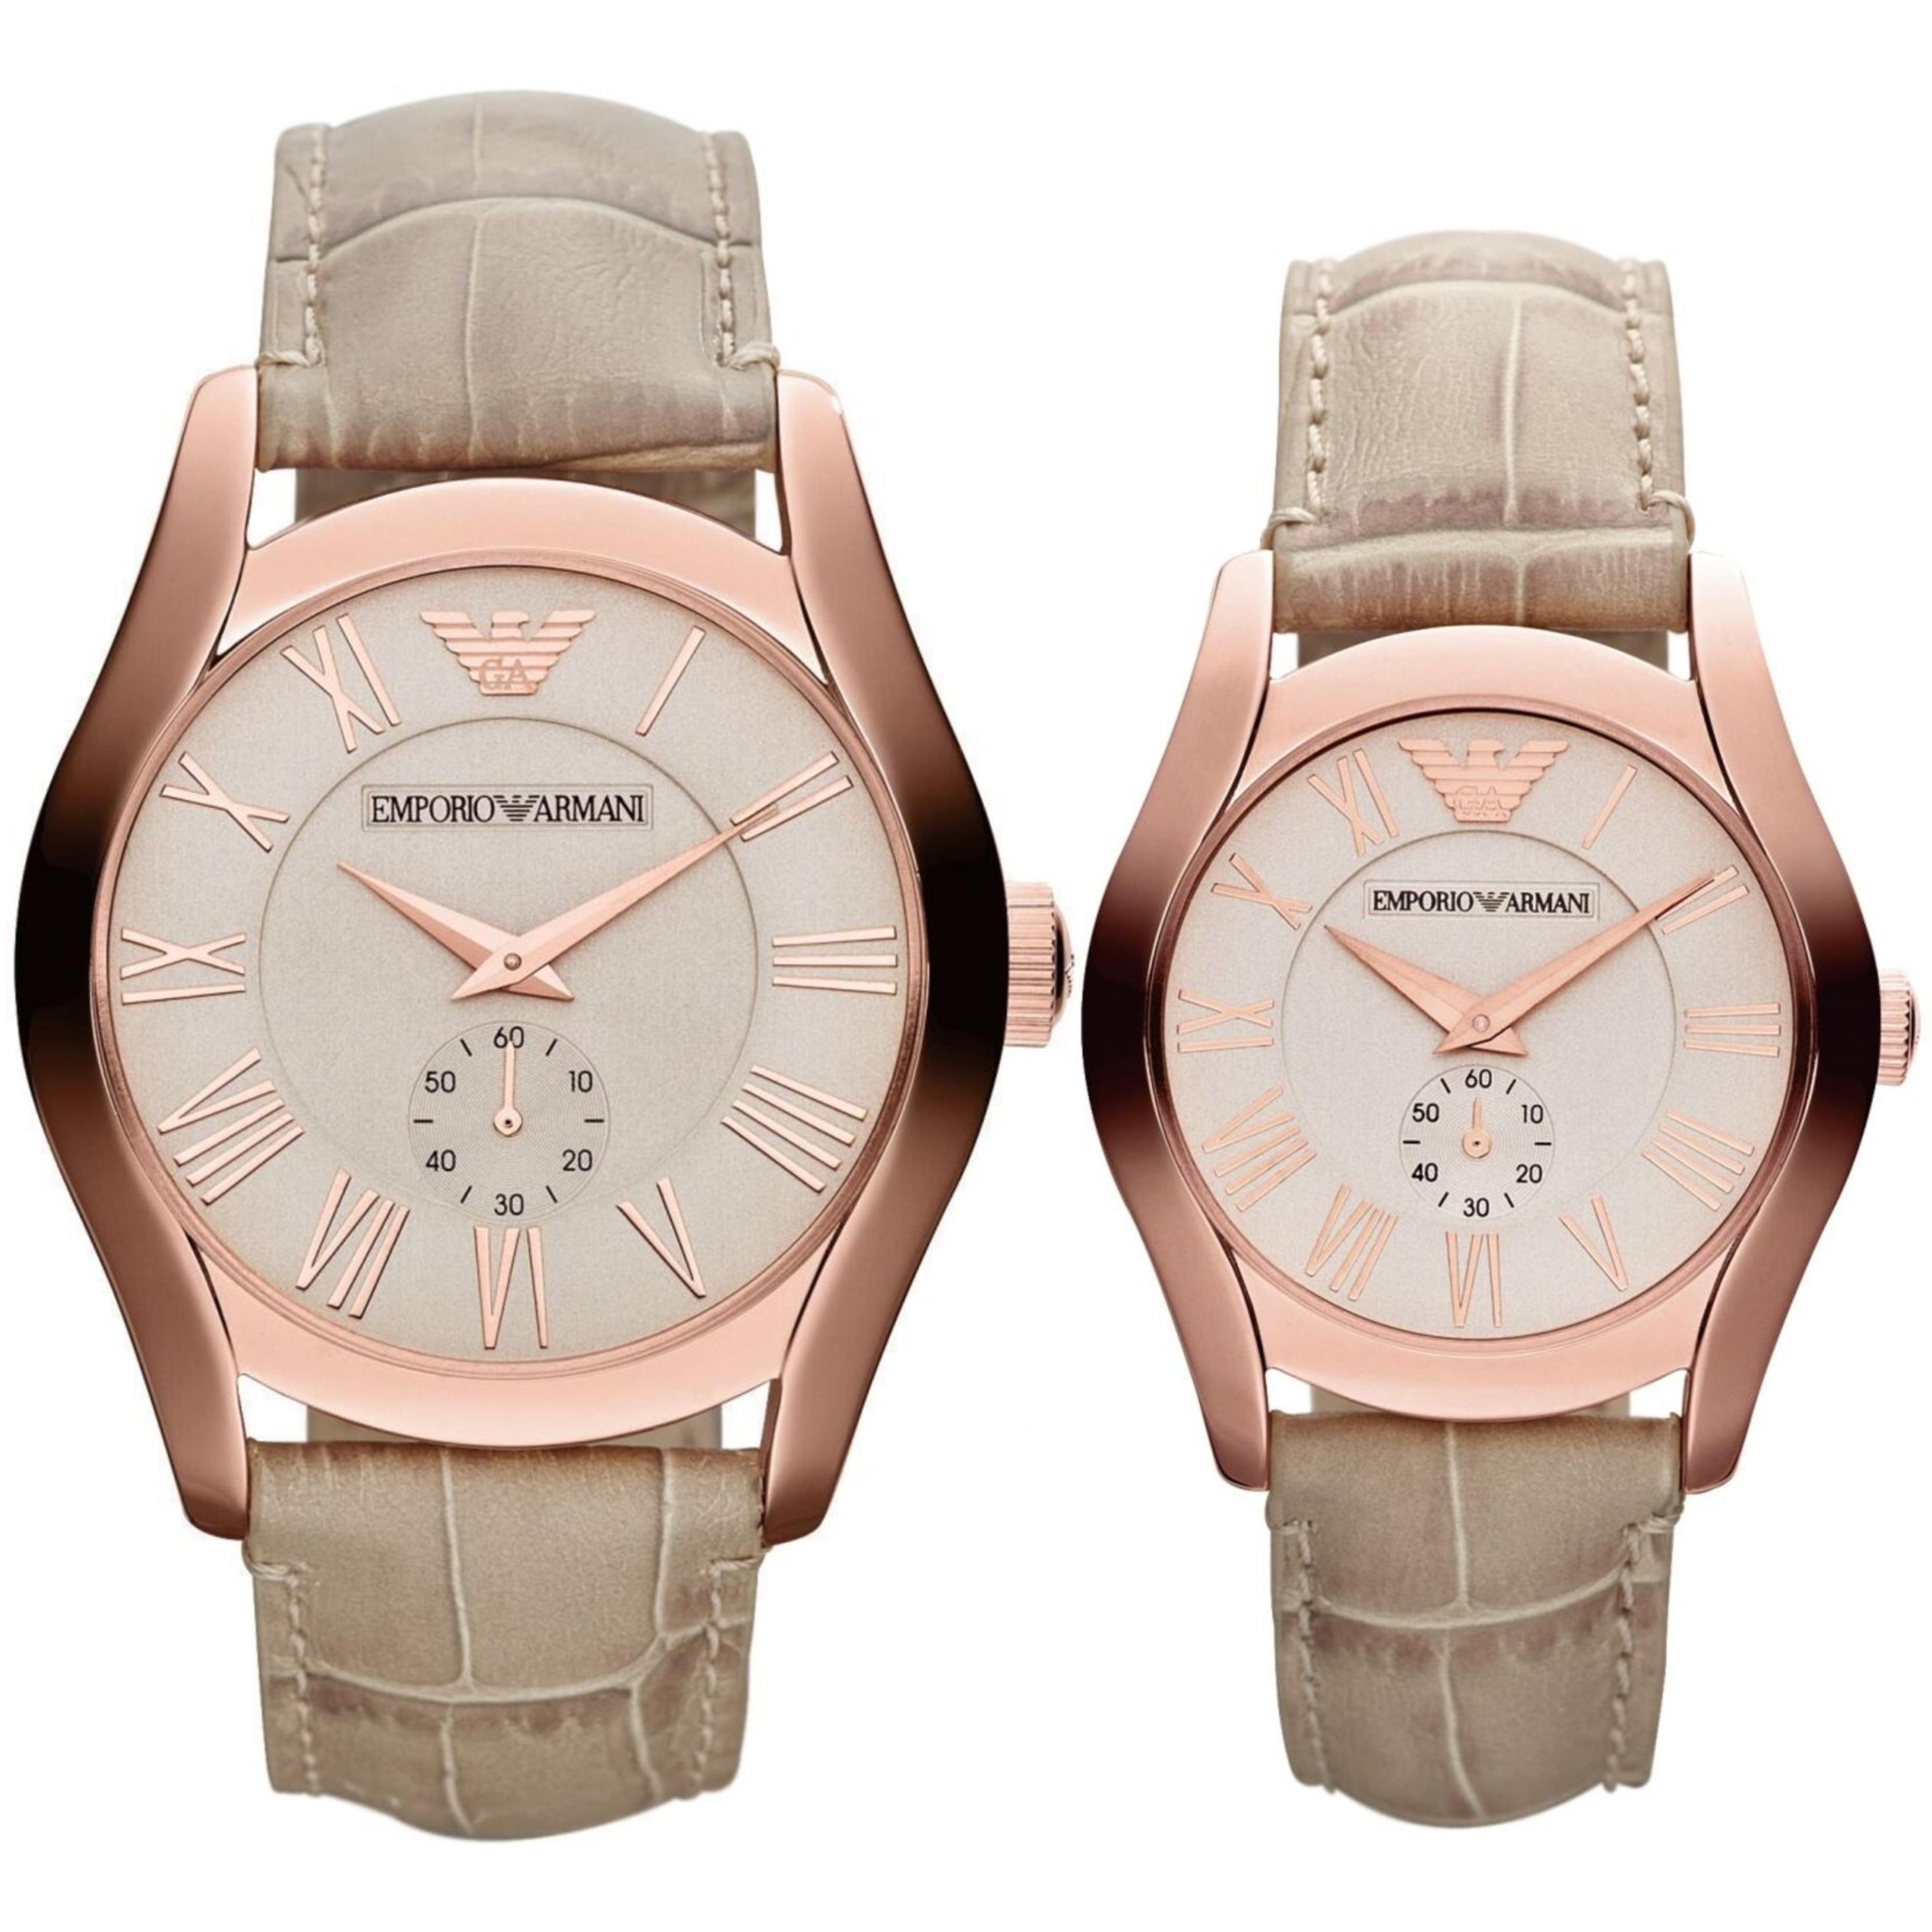 Emporio Armani Classic Couple Watch | Salmon Dial | Cream Leather Band | AR1667+AR1670